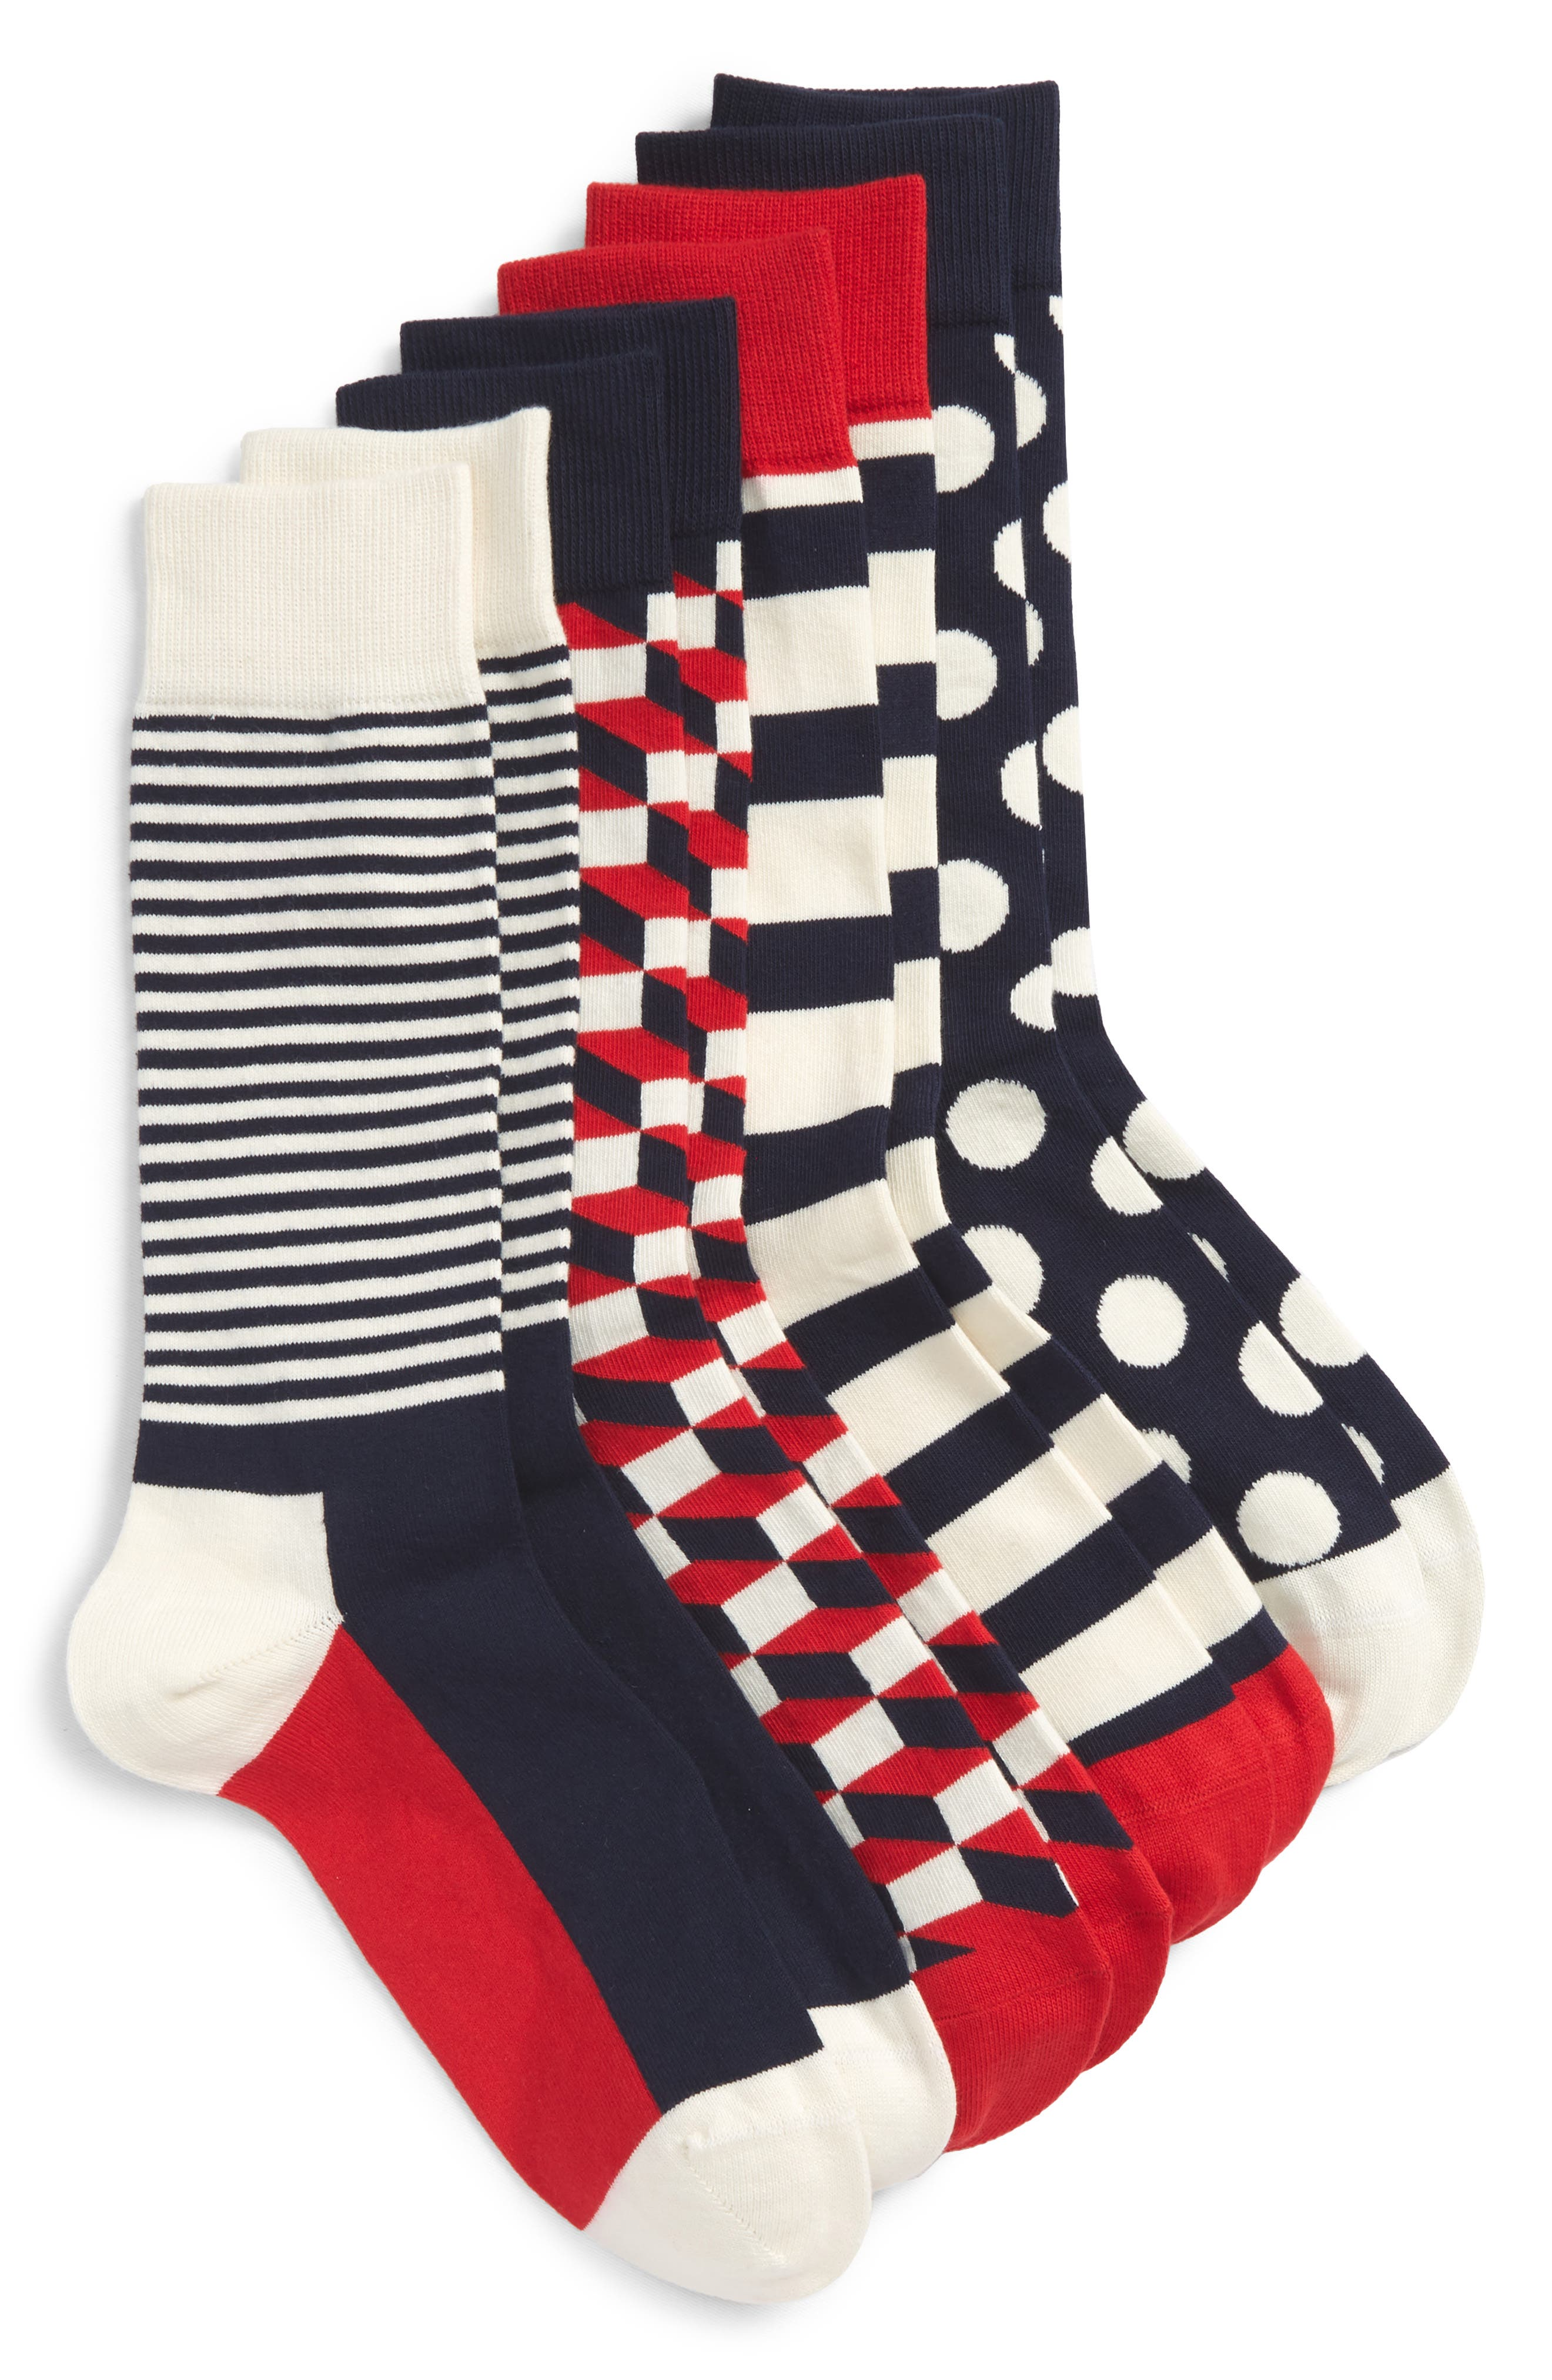 4-Pack Sock Gift Set,                             Main thumbnail 1, color,